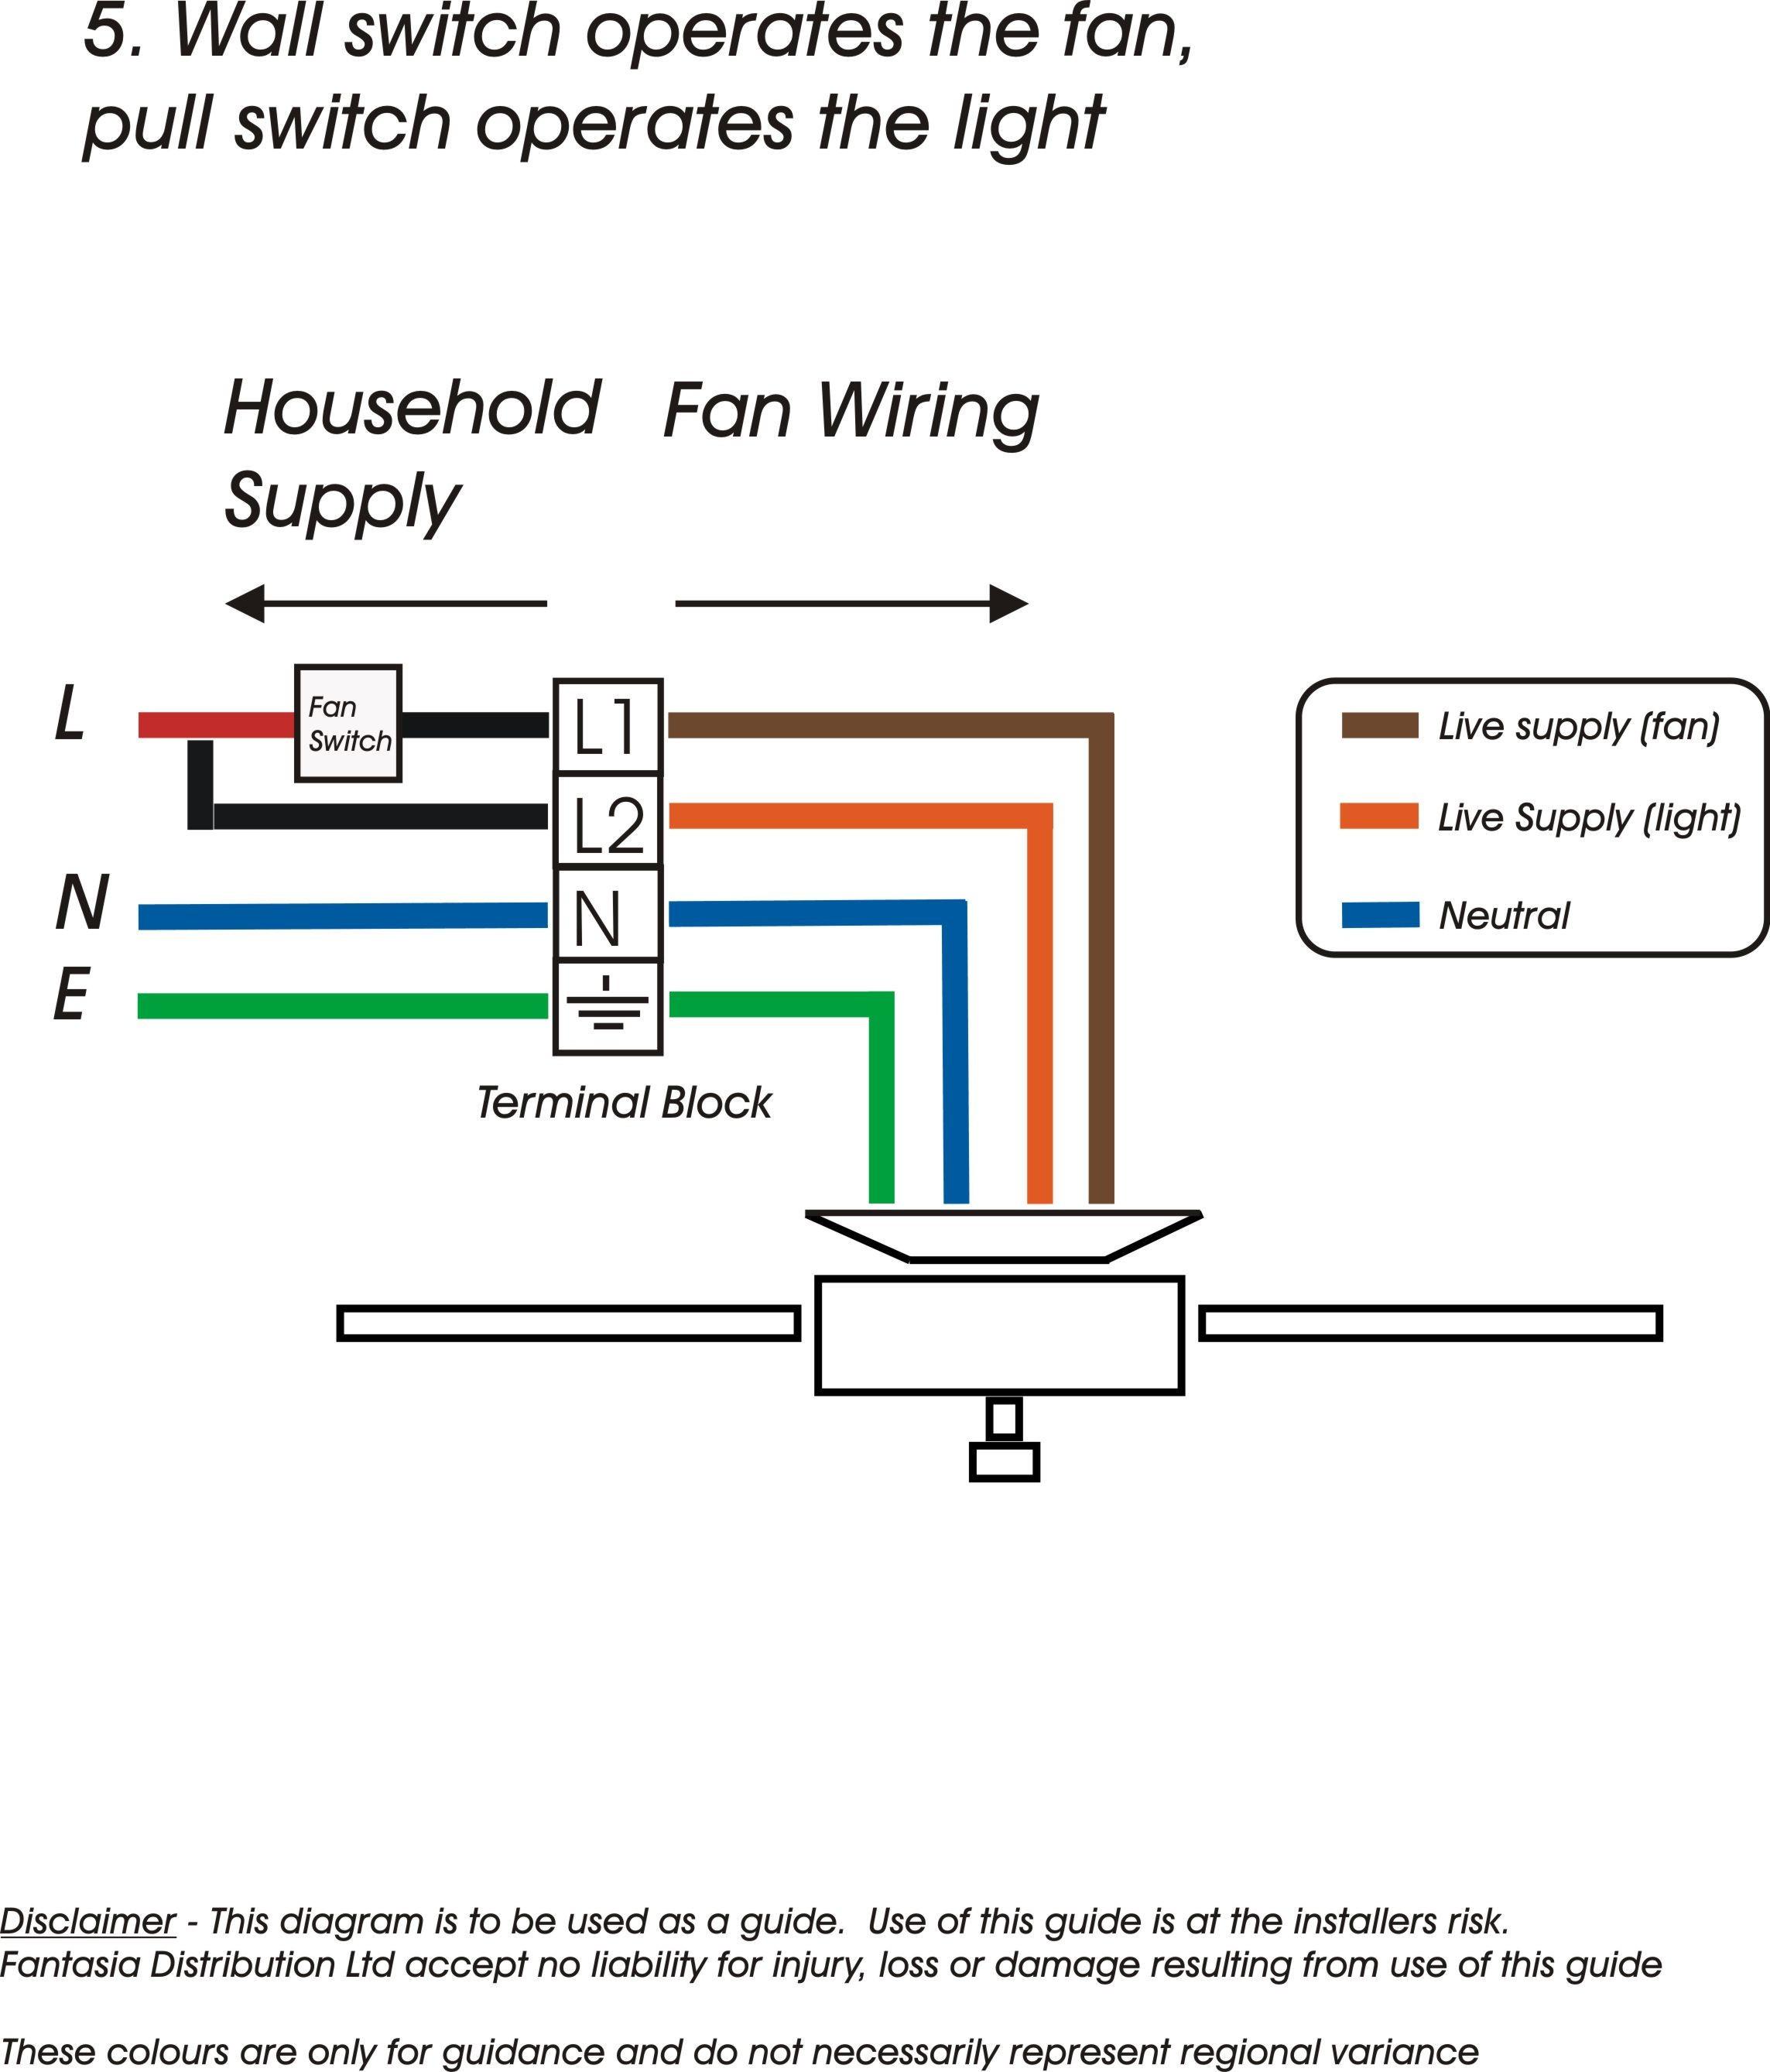 Hampton Bay Ceiling Fan Pull Chain Wiring Diagrams | Wiring Diagram - Ceiling Fan Switch Wiring Diagram